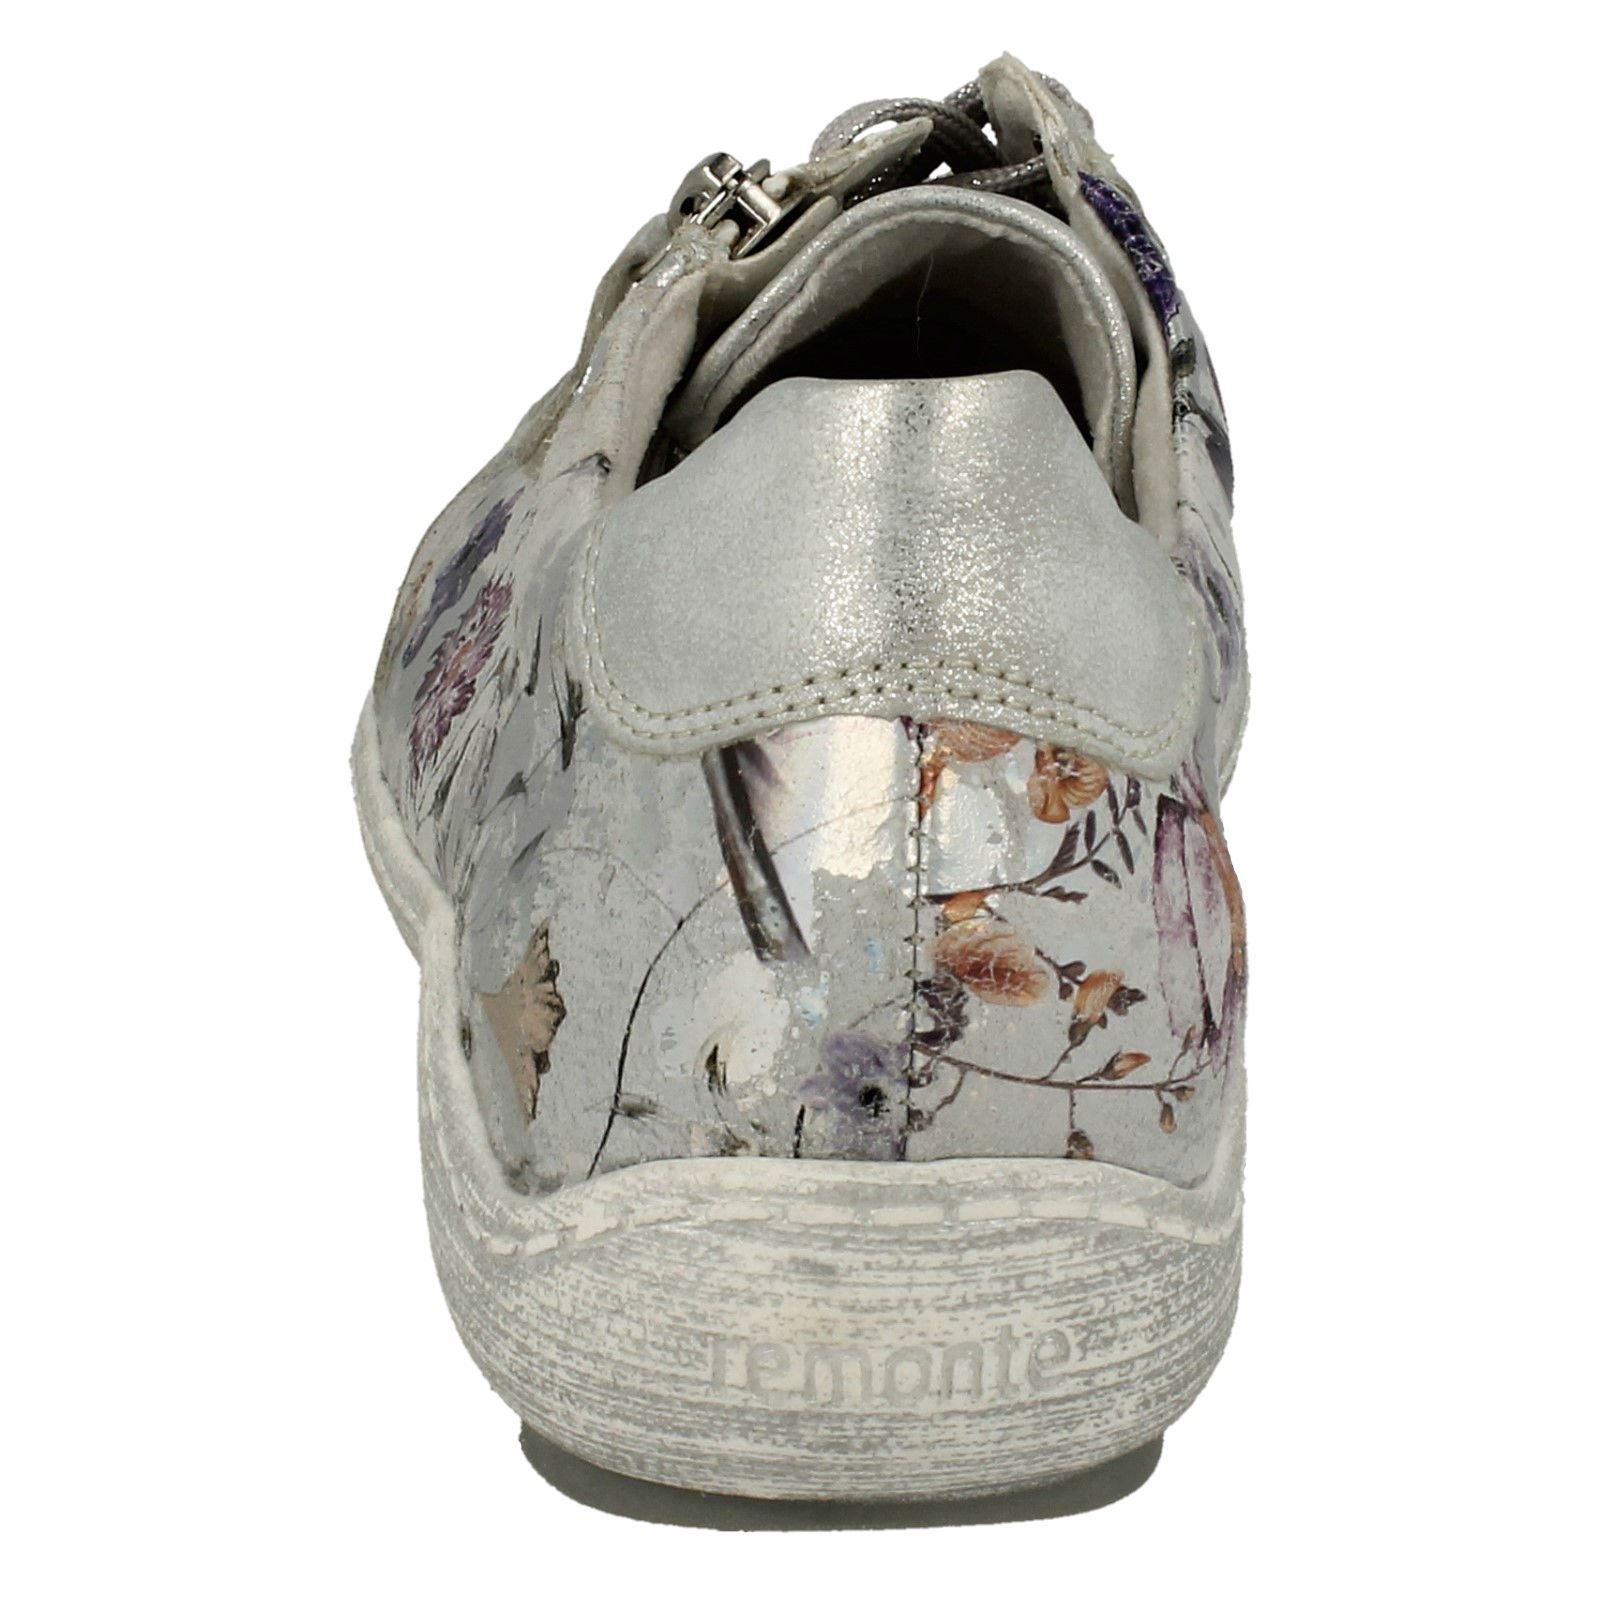 Femmes REMONTE Baskets Baskets REMONTE Décontractées Style Chaussures